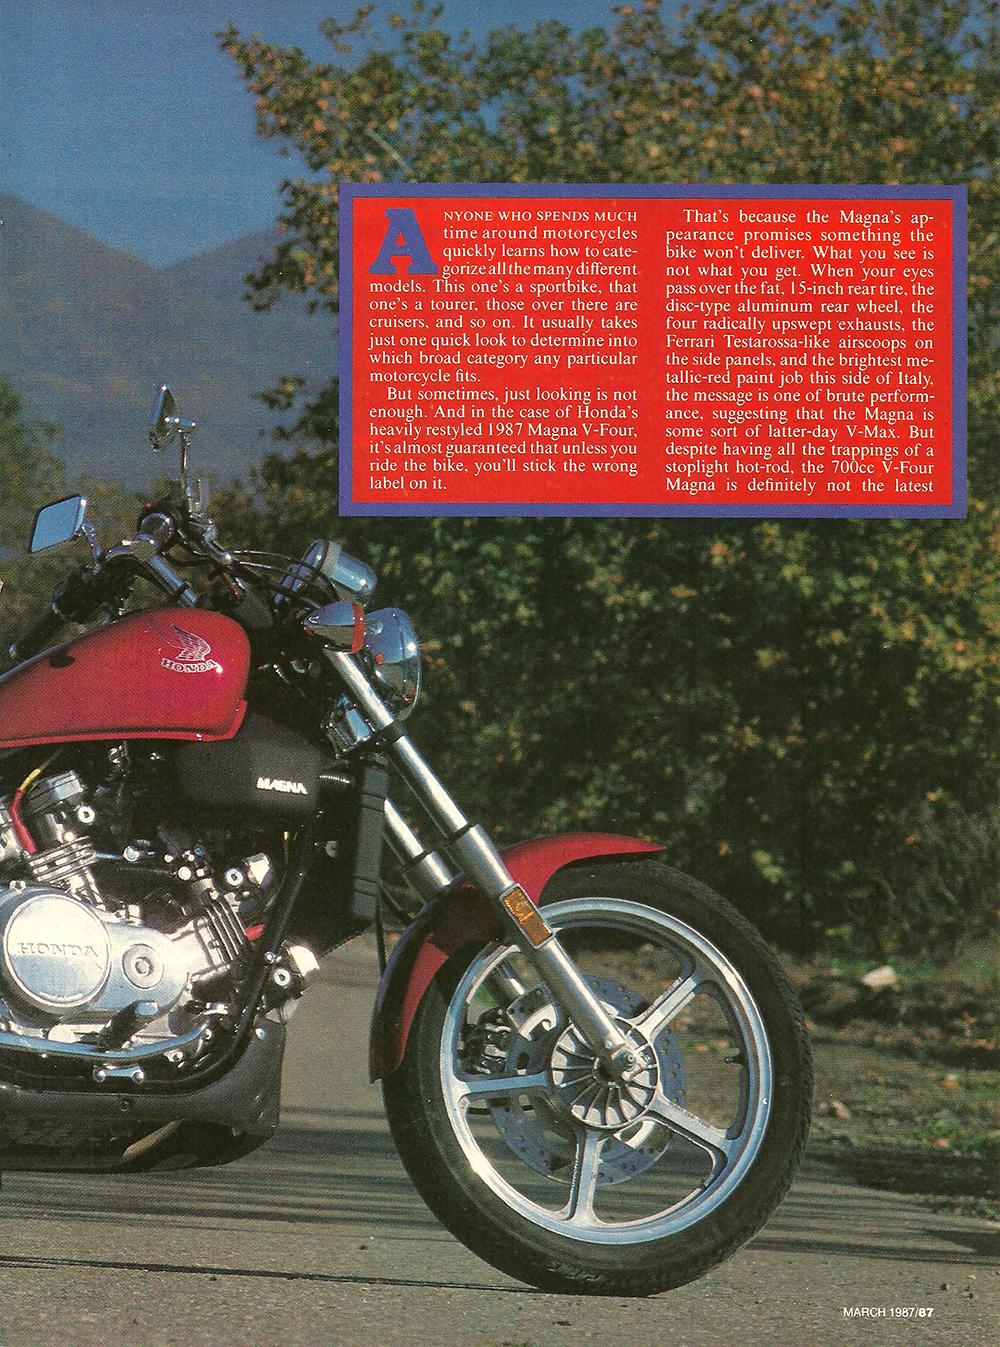 1987 Honda 700 Magna road test 02.jpg